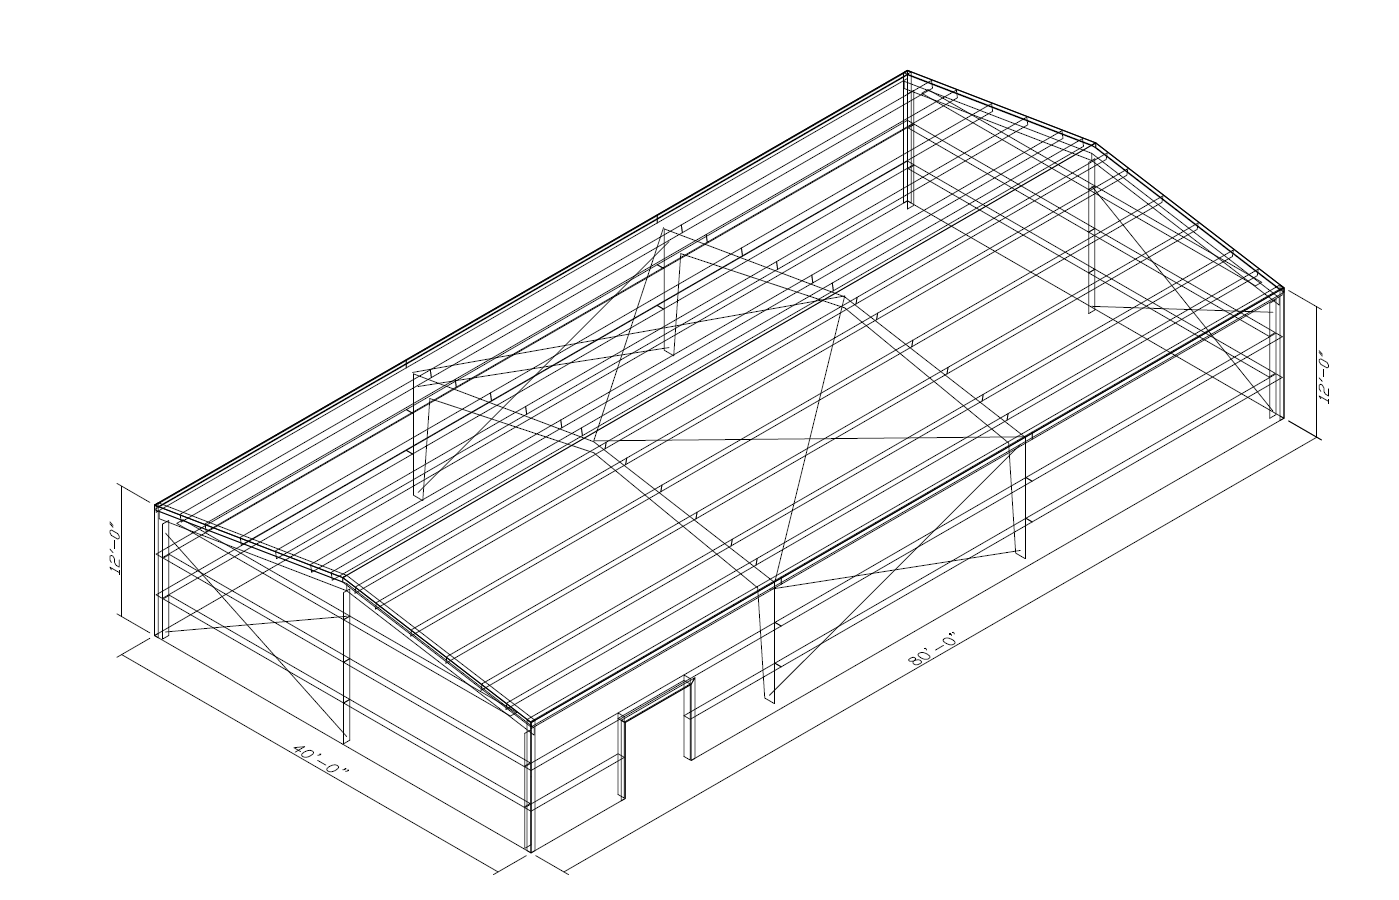 Prefabricated 40 X 80 Metal Building Kits